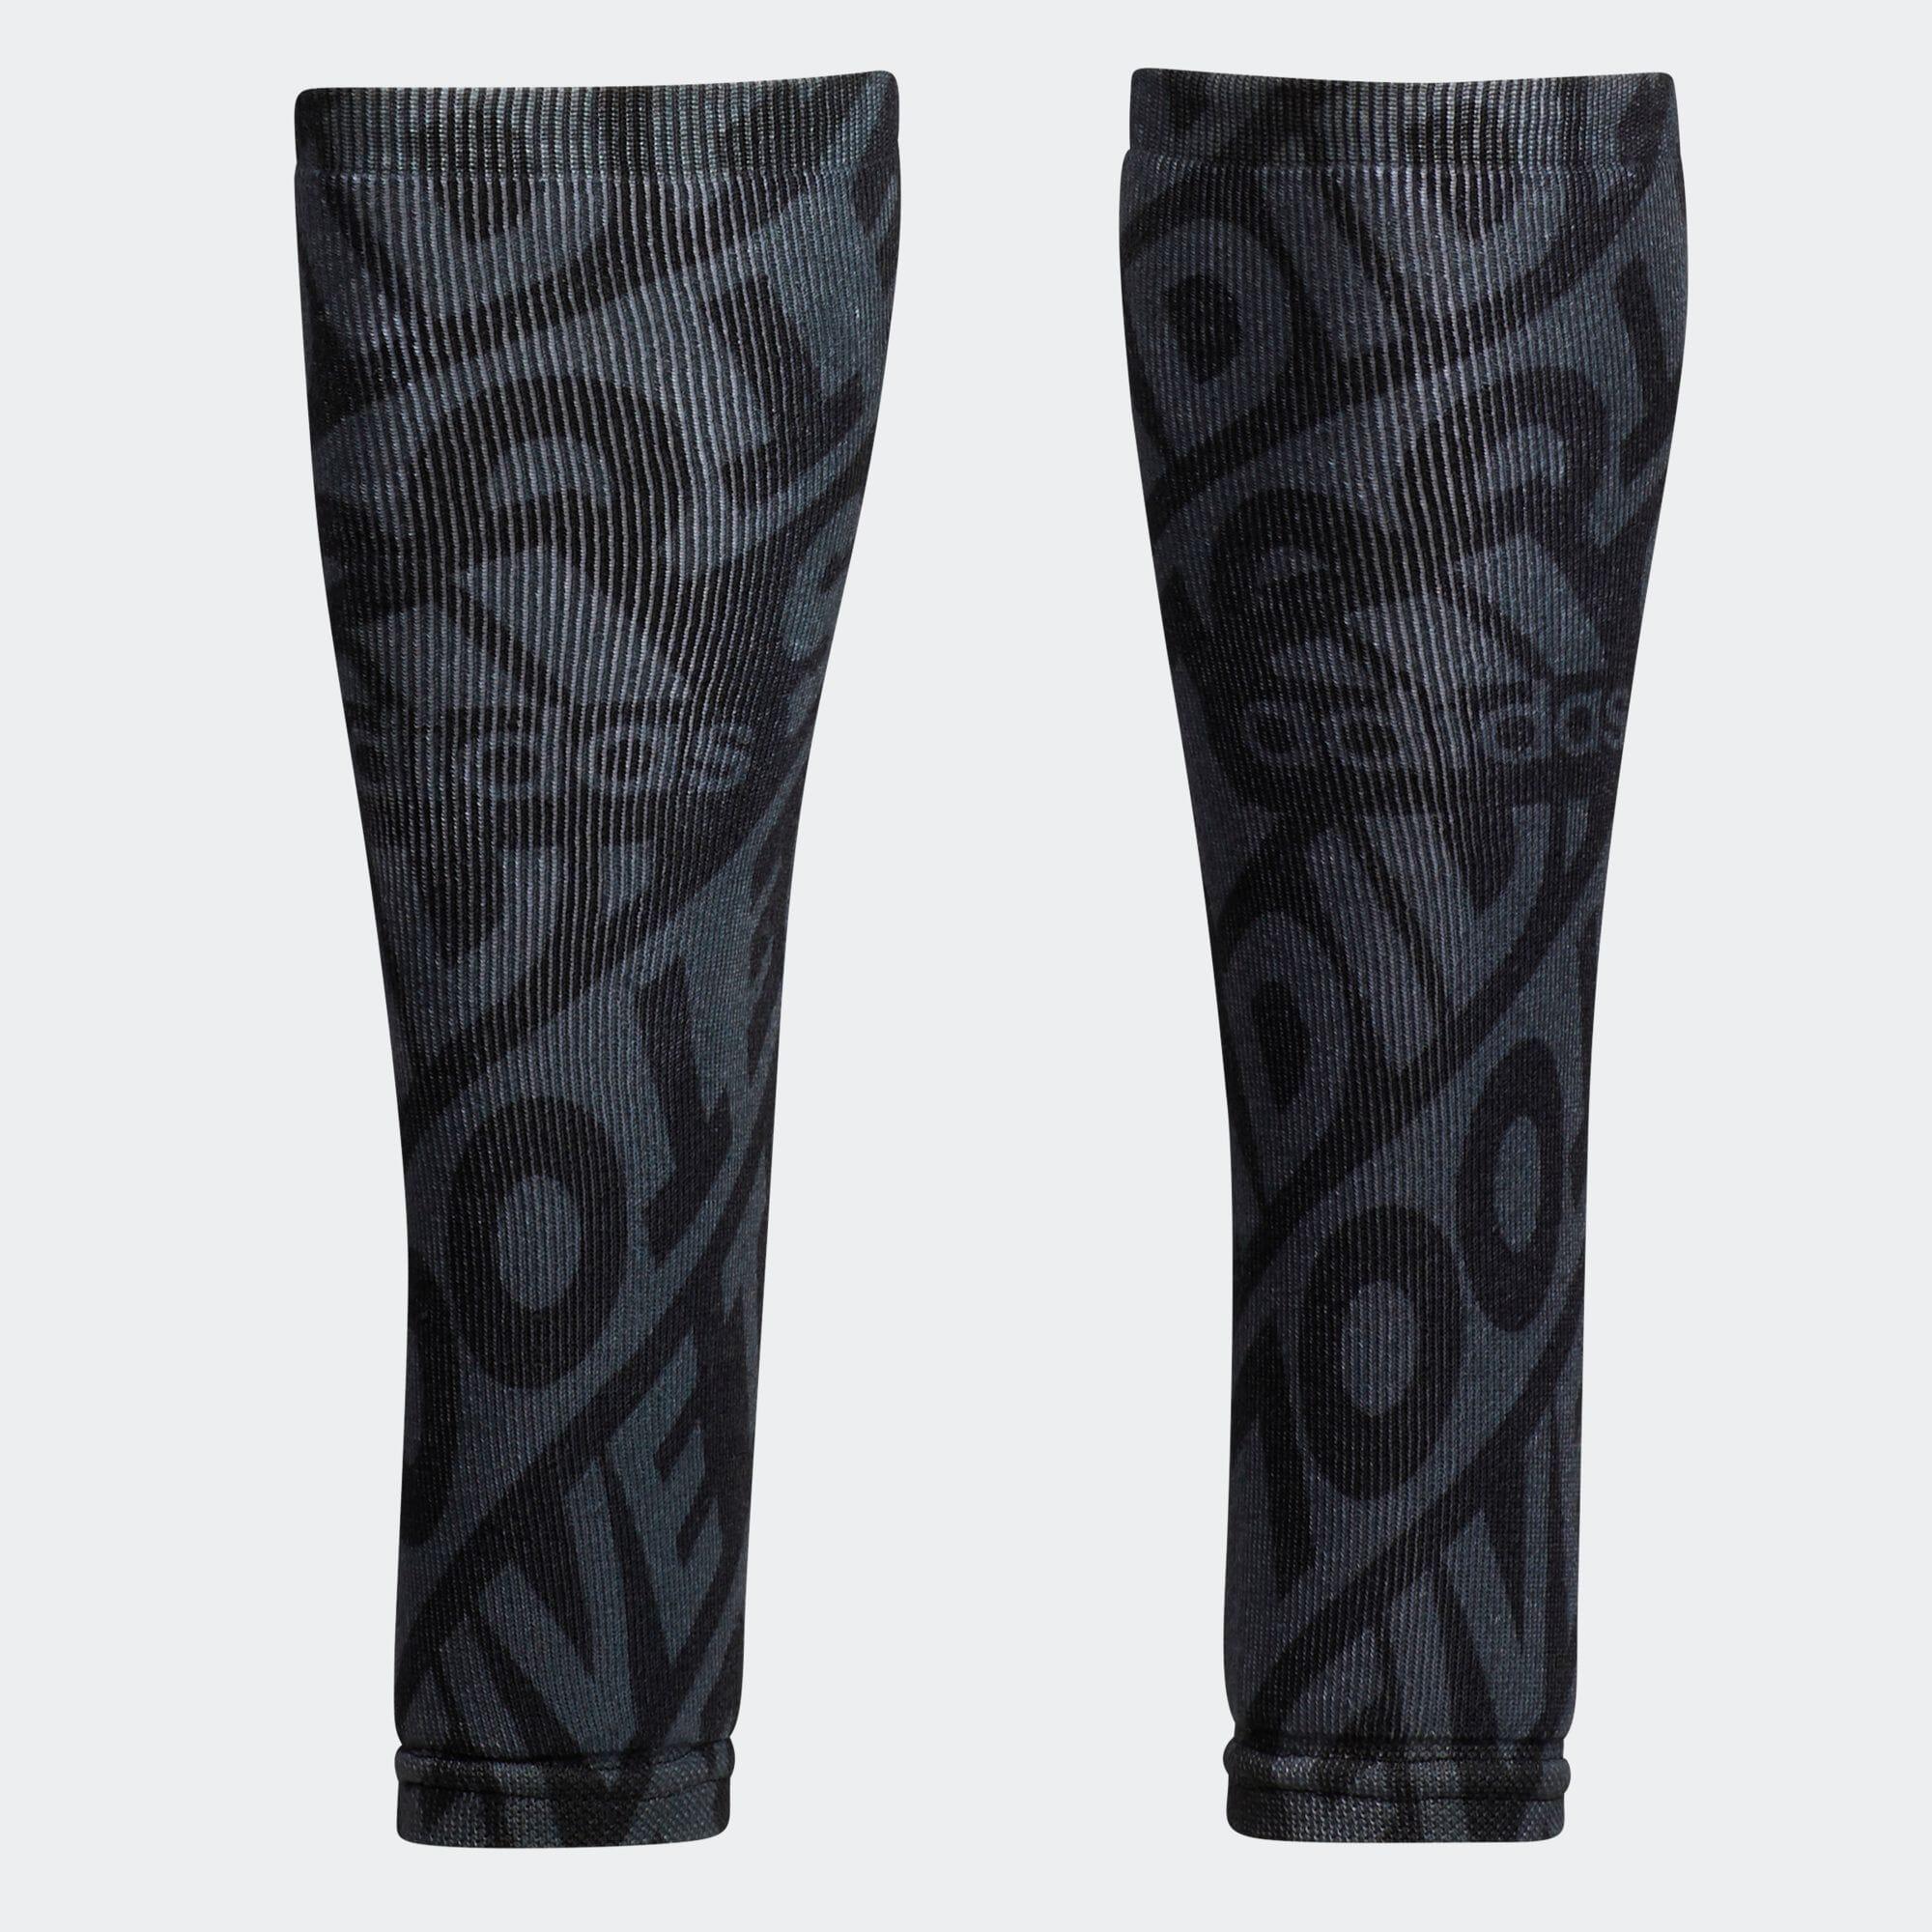 5T レッグウォーマー / Five Tool Leg Warmers